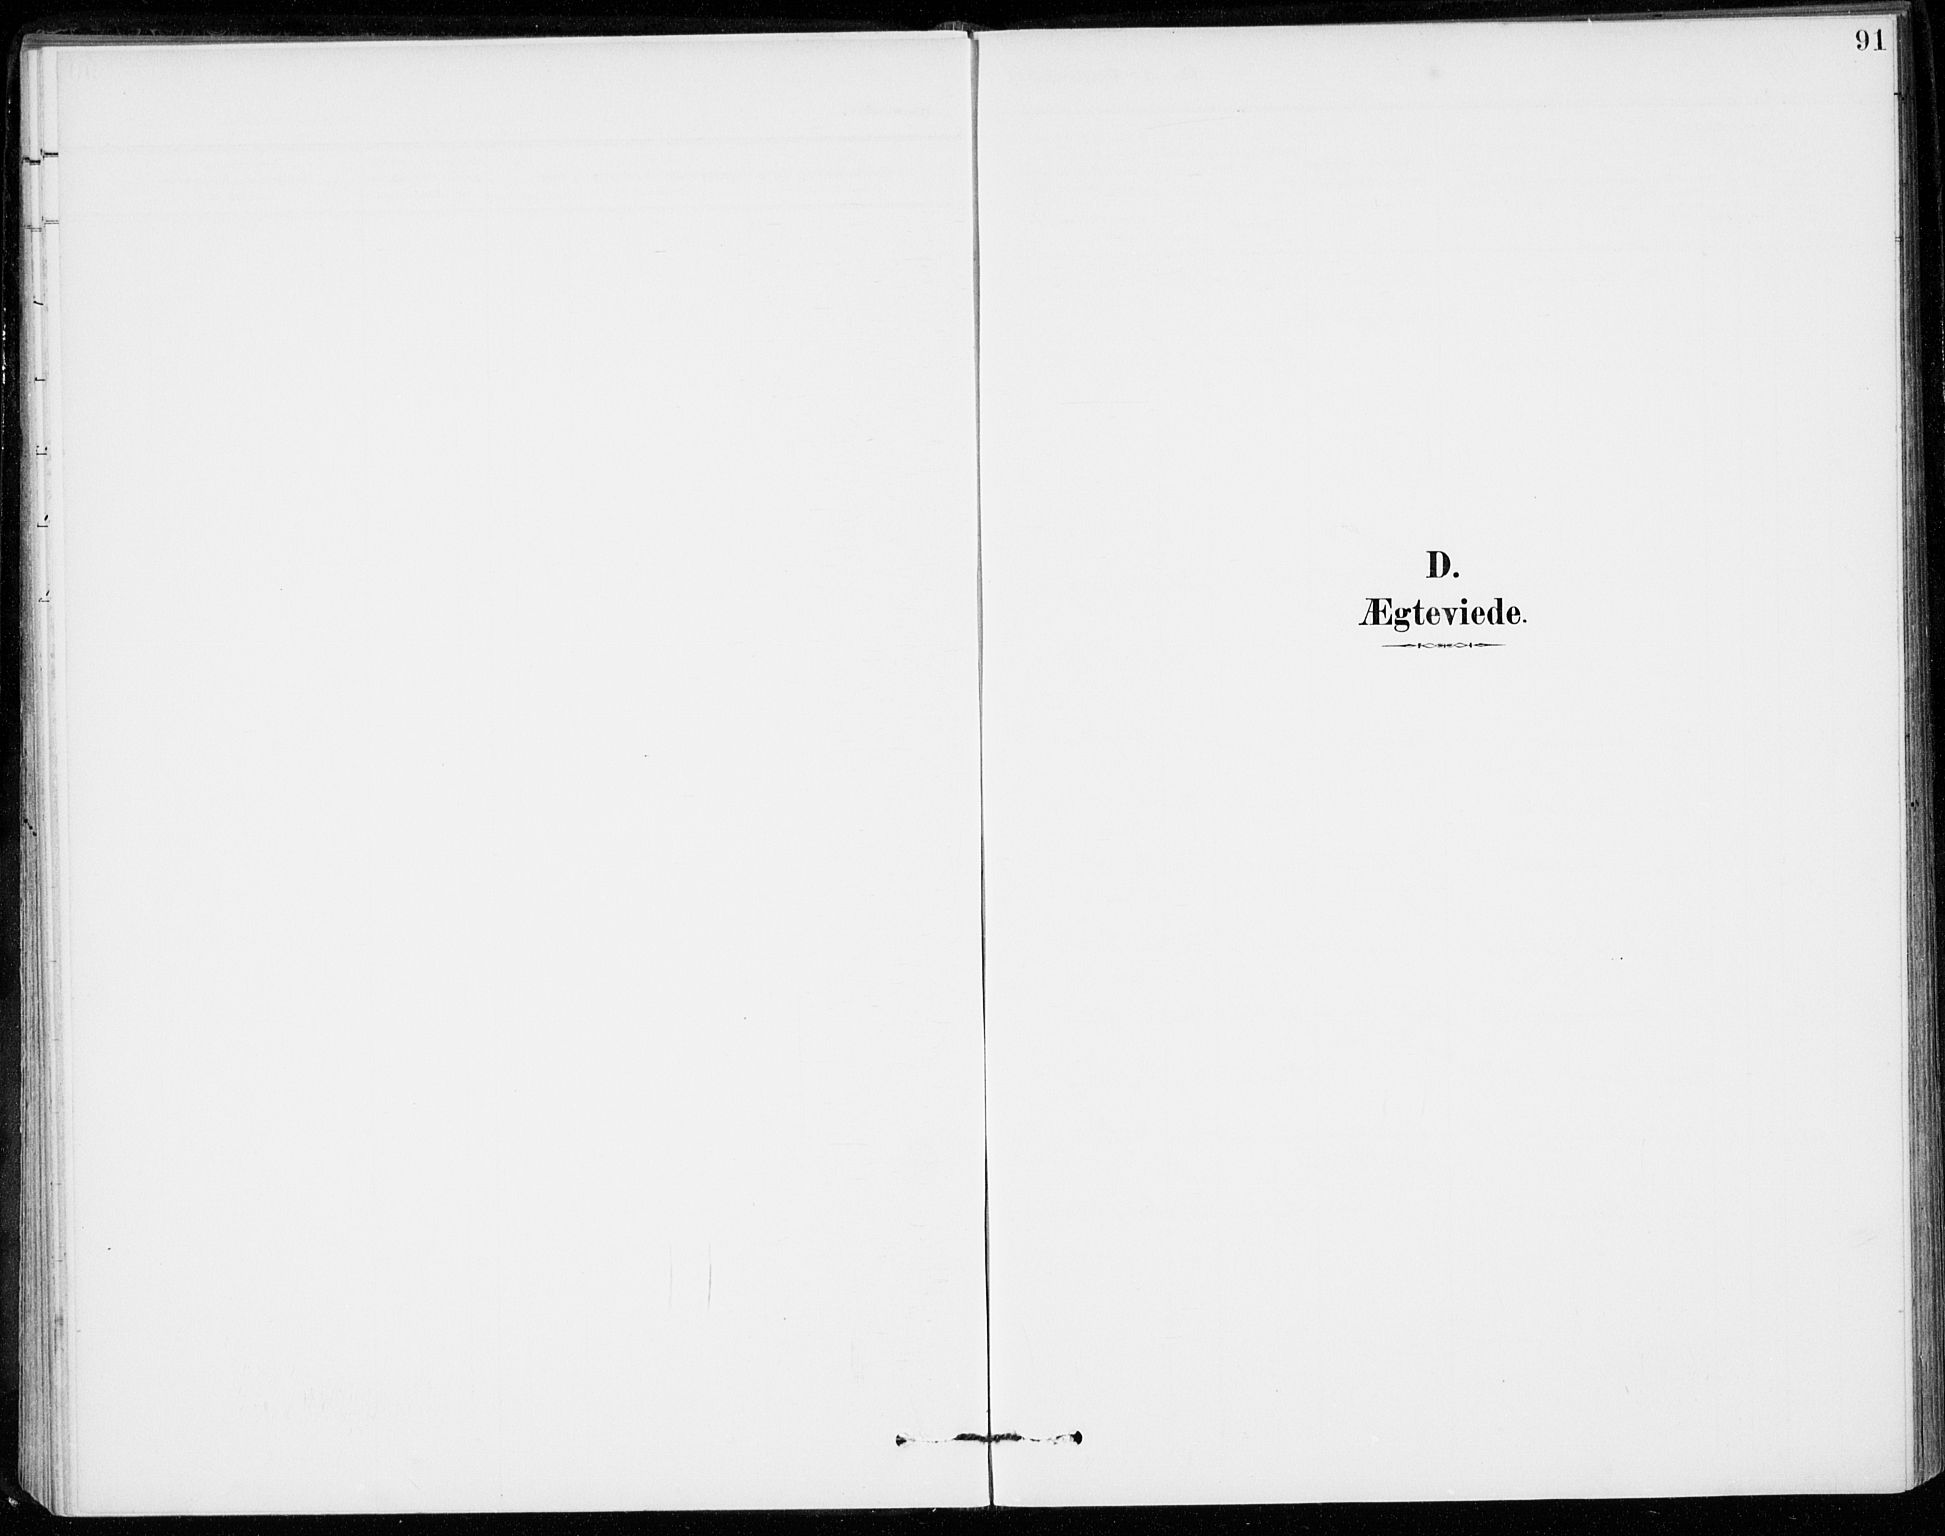 SAKO, Sigdal kirkebøker, F/Fc/L0002: Ministerialbok nr. III 2, 1894-1911, s. 91